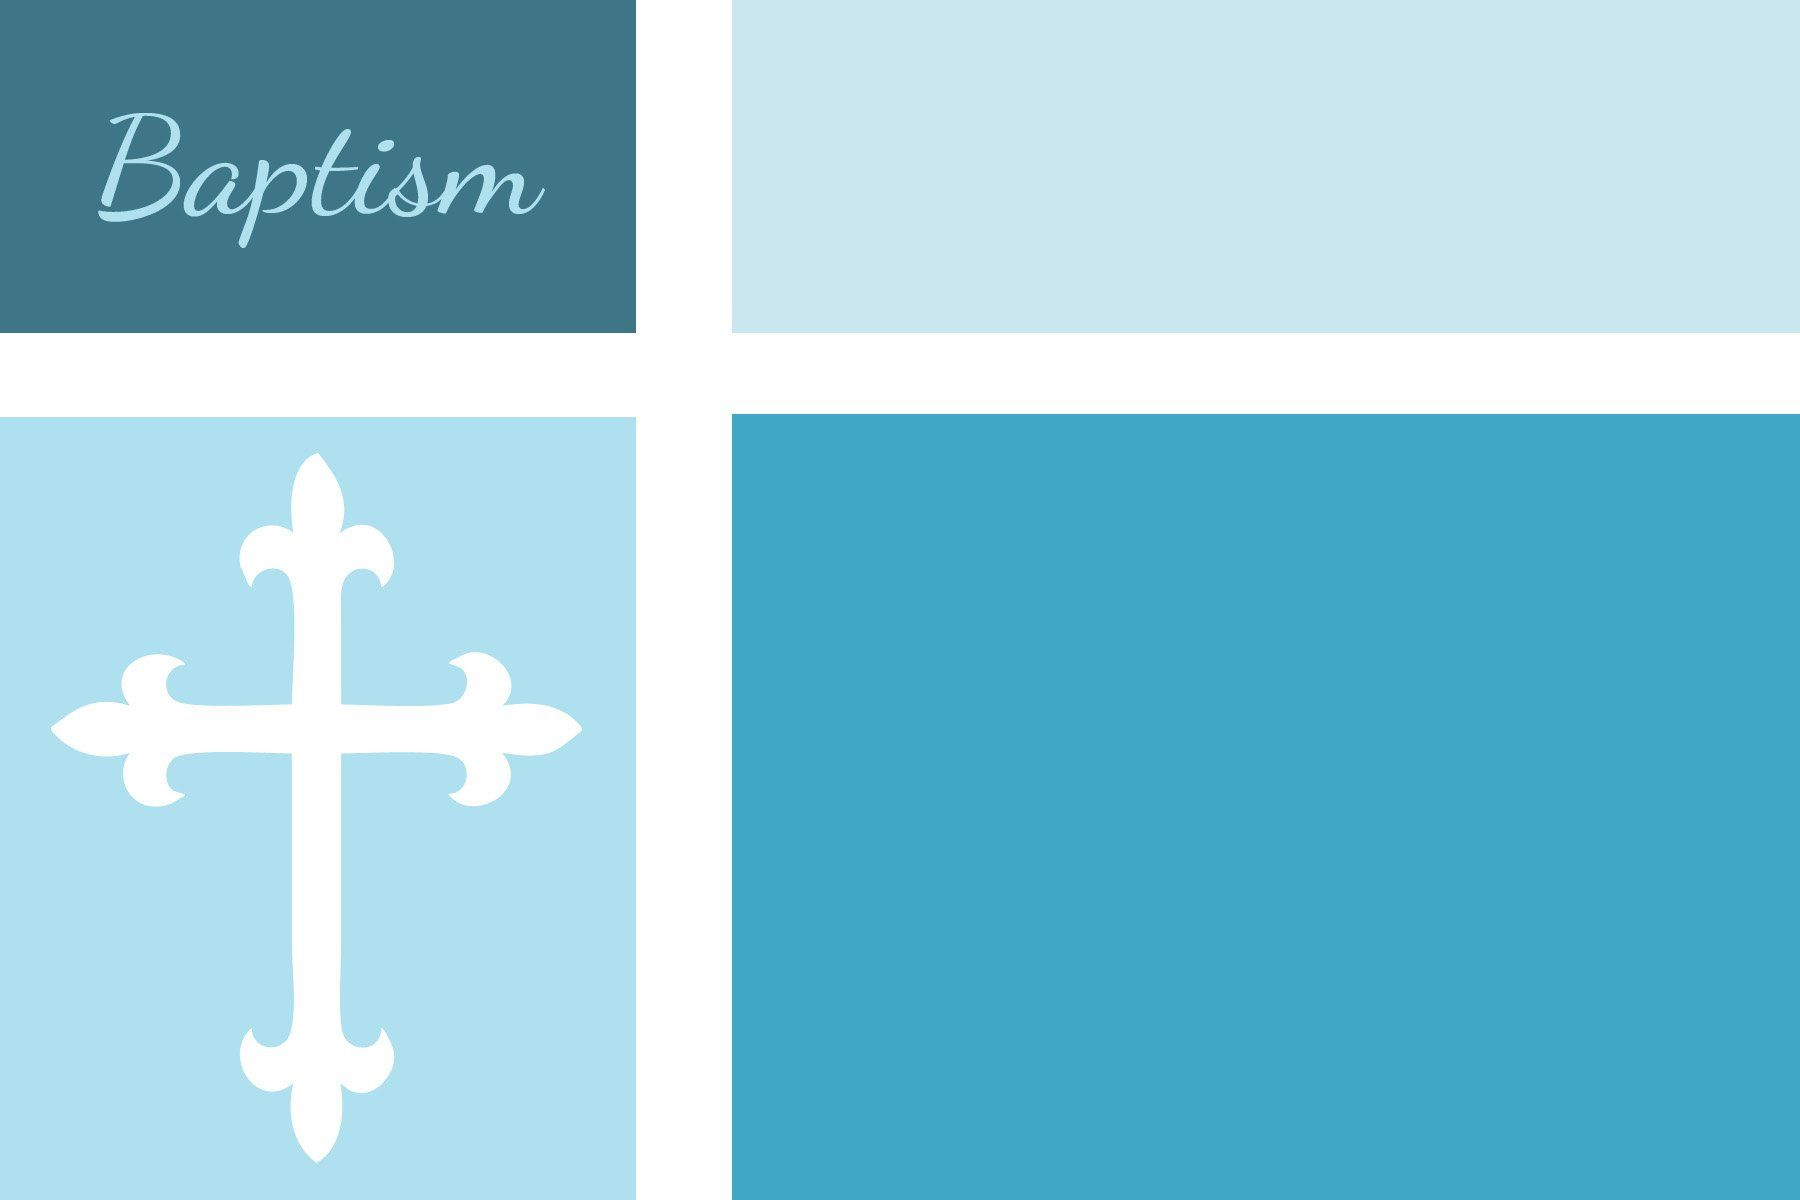 Baptism Invitation Blank Templates Baptism Invitations Christening Invitations Invitation Background